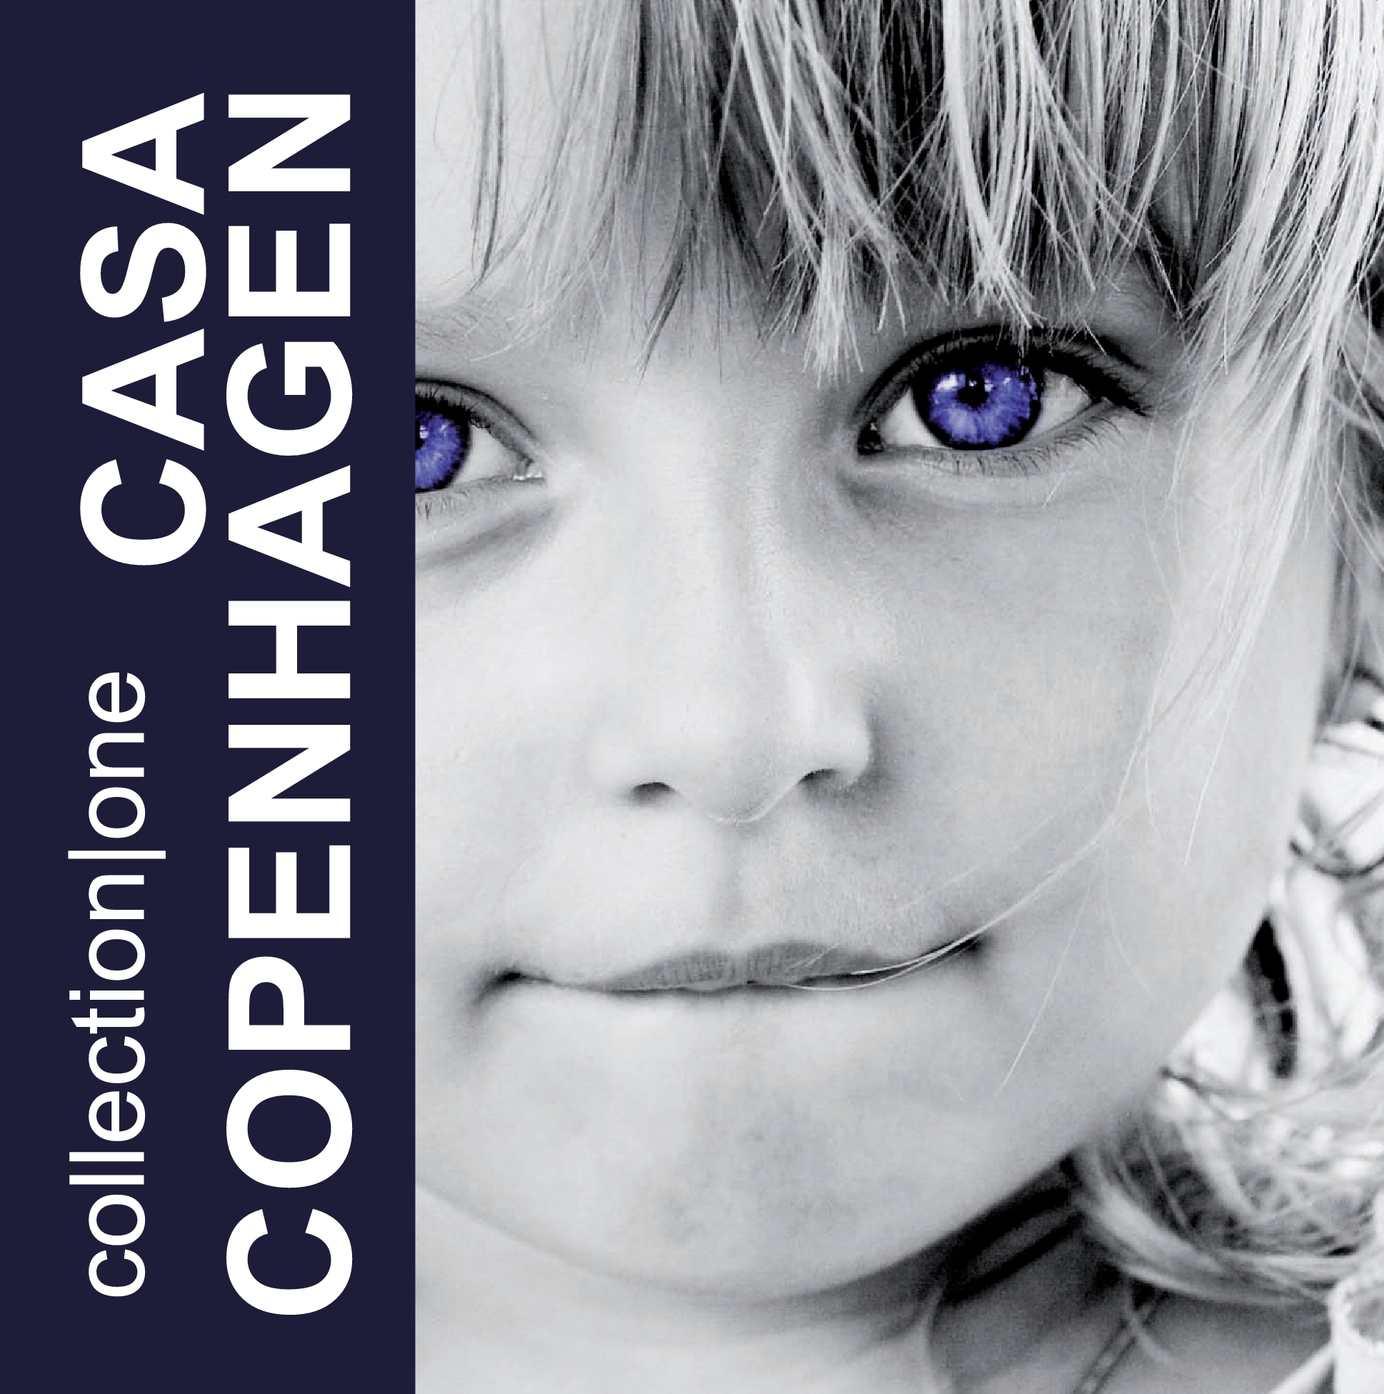 Calam o catalogo casa copenhagen 2011 - Casa copenaghen ...